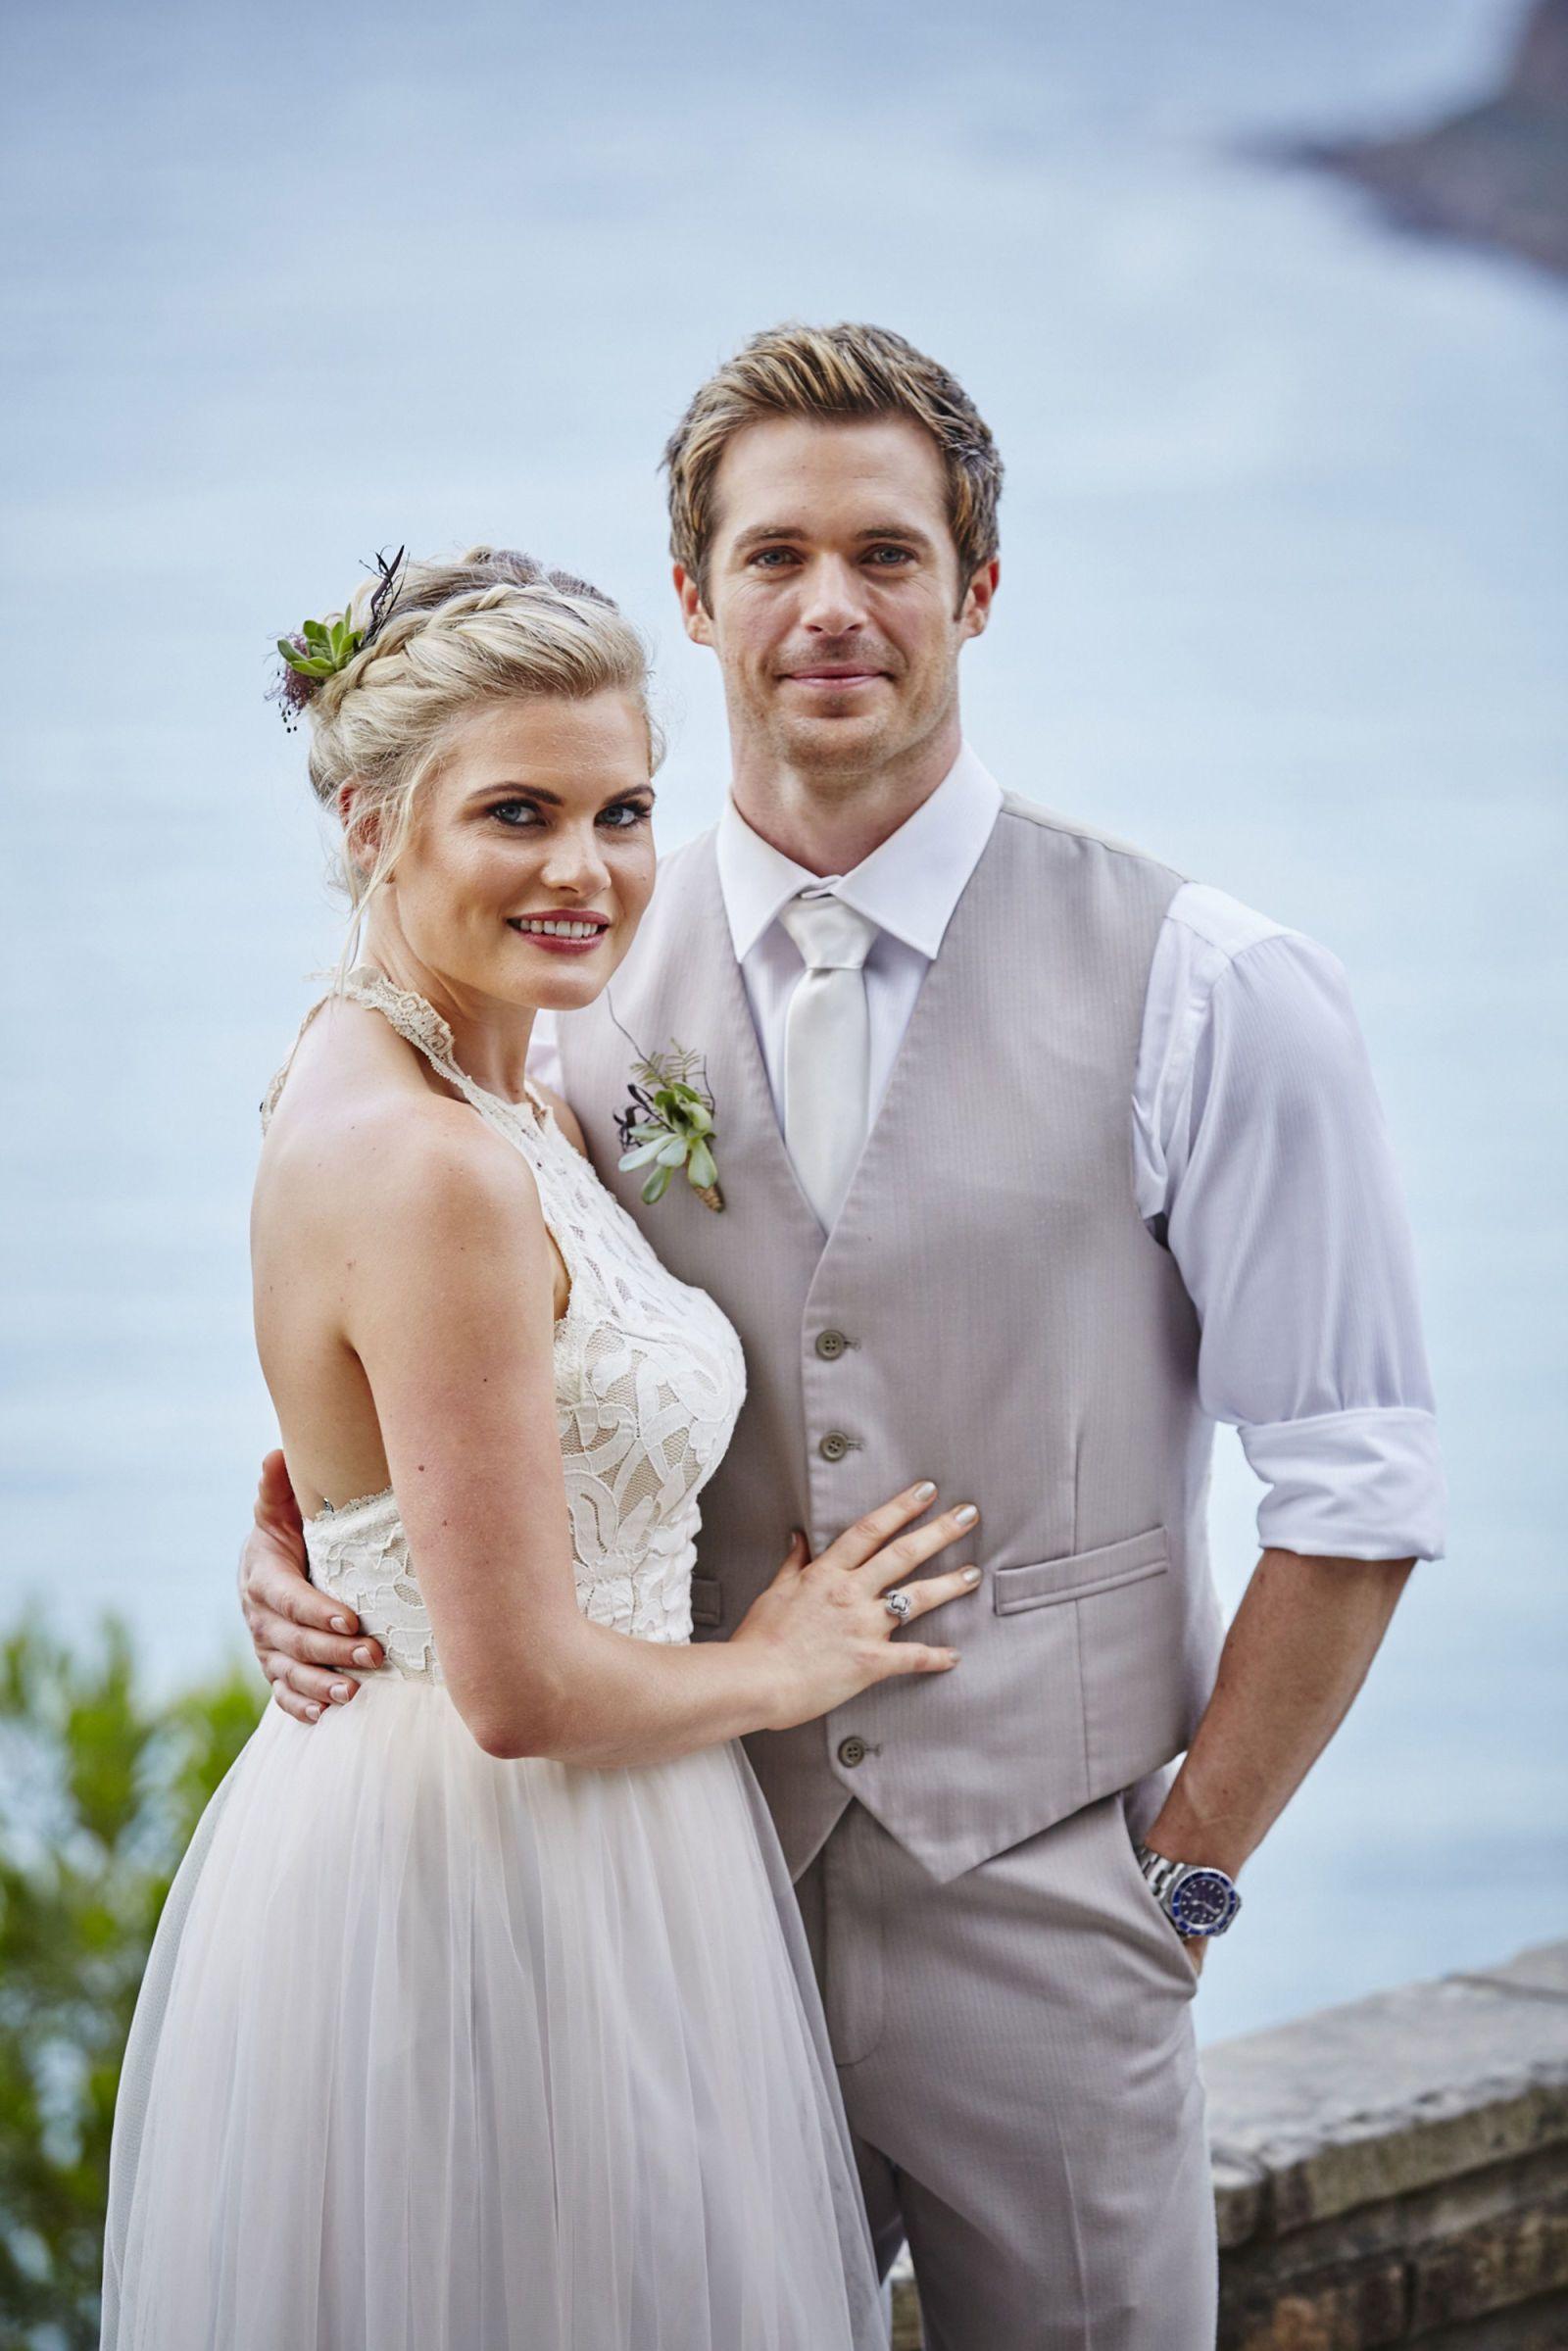 Home and away leah wedding dress designer